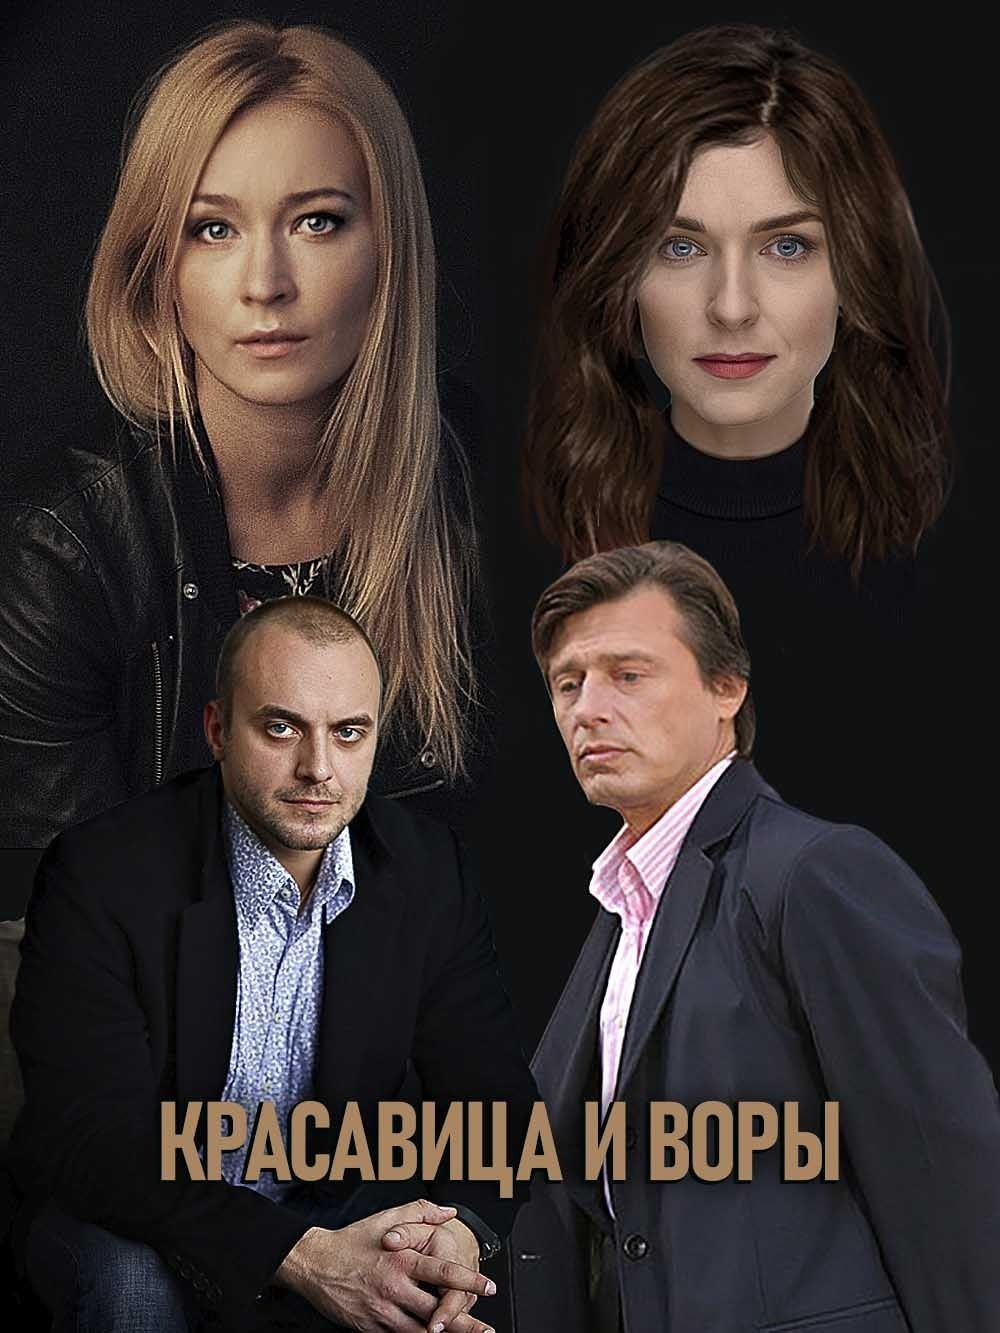 Детектив «Kpacaвицa и вopы» (2020) HD